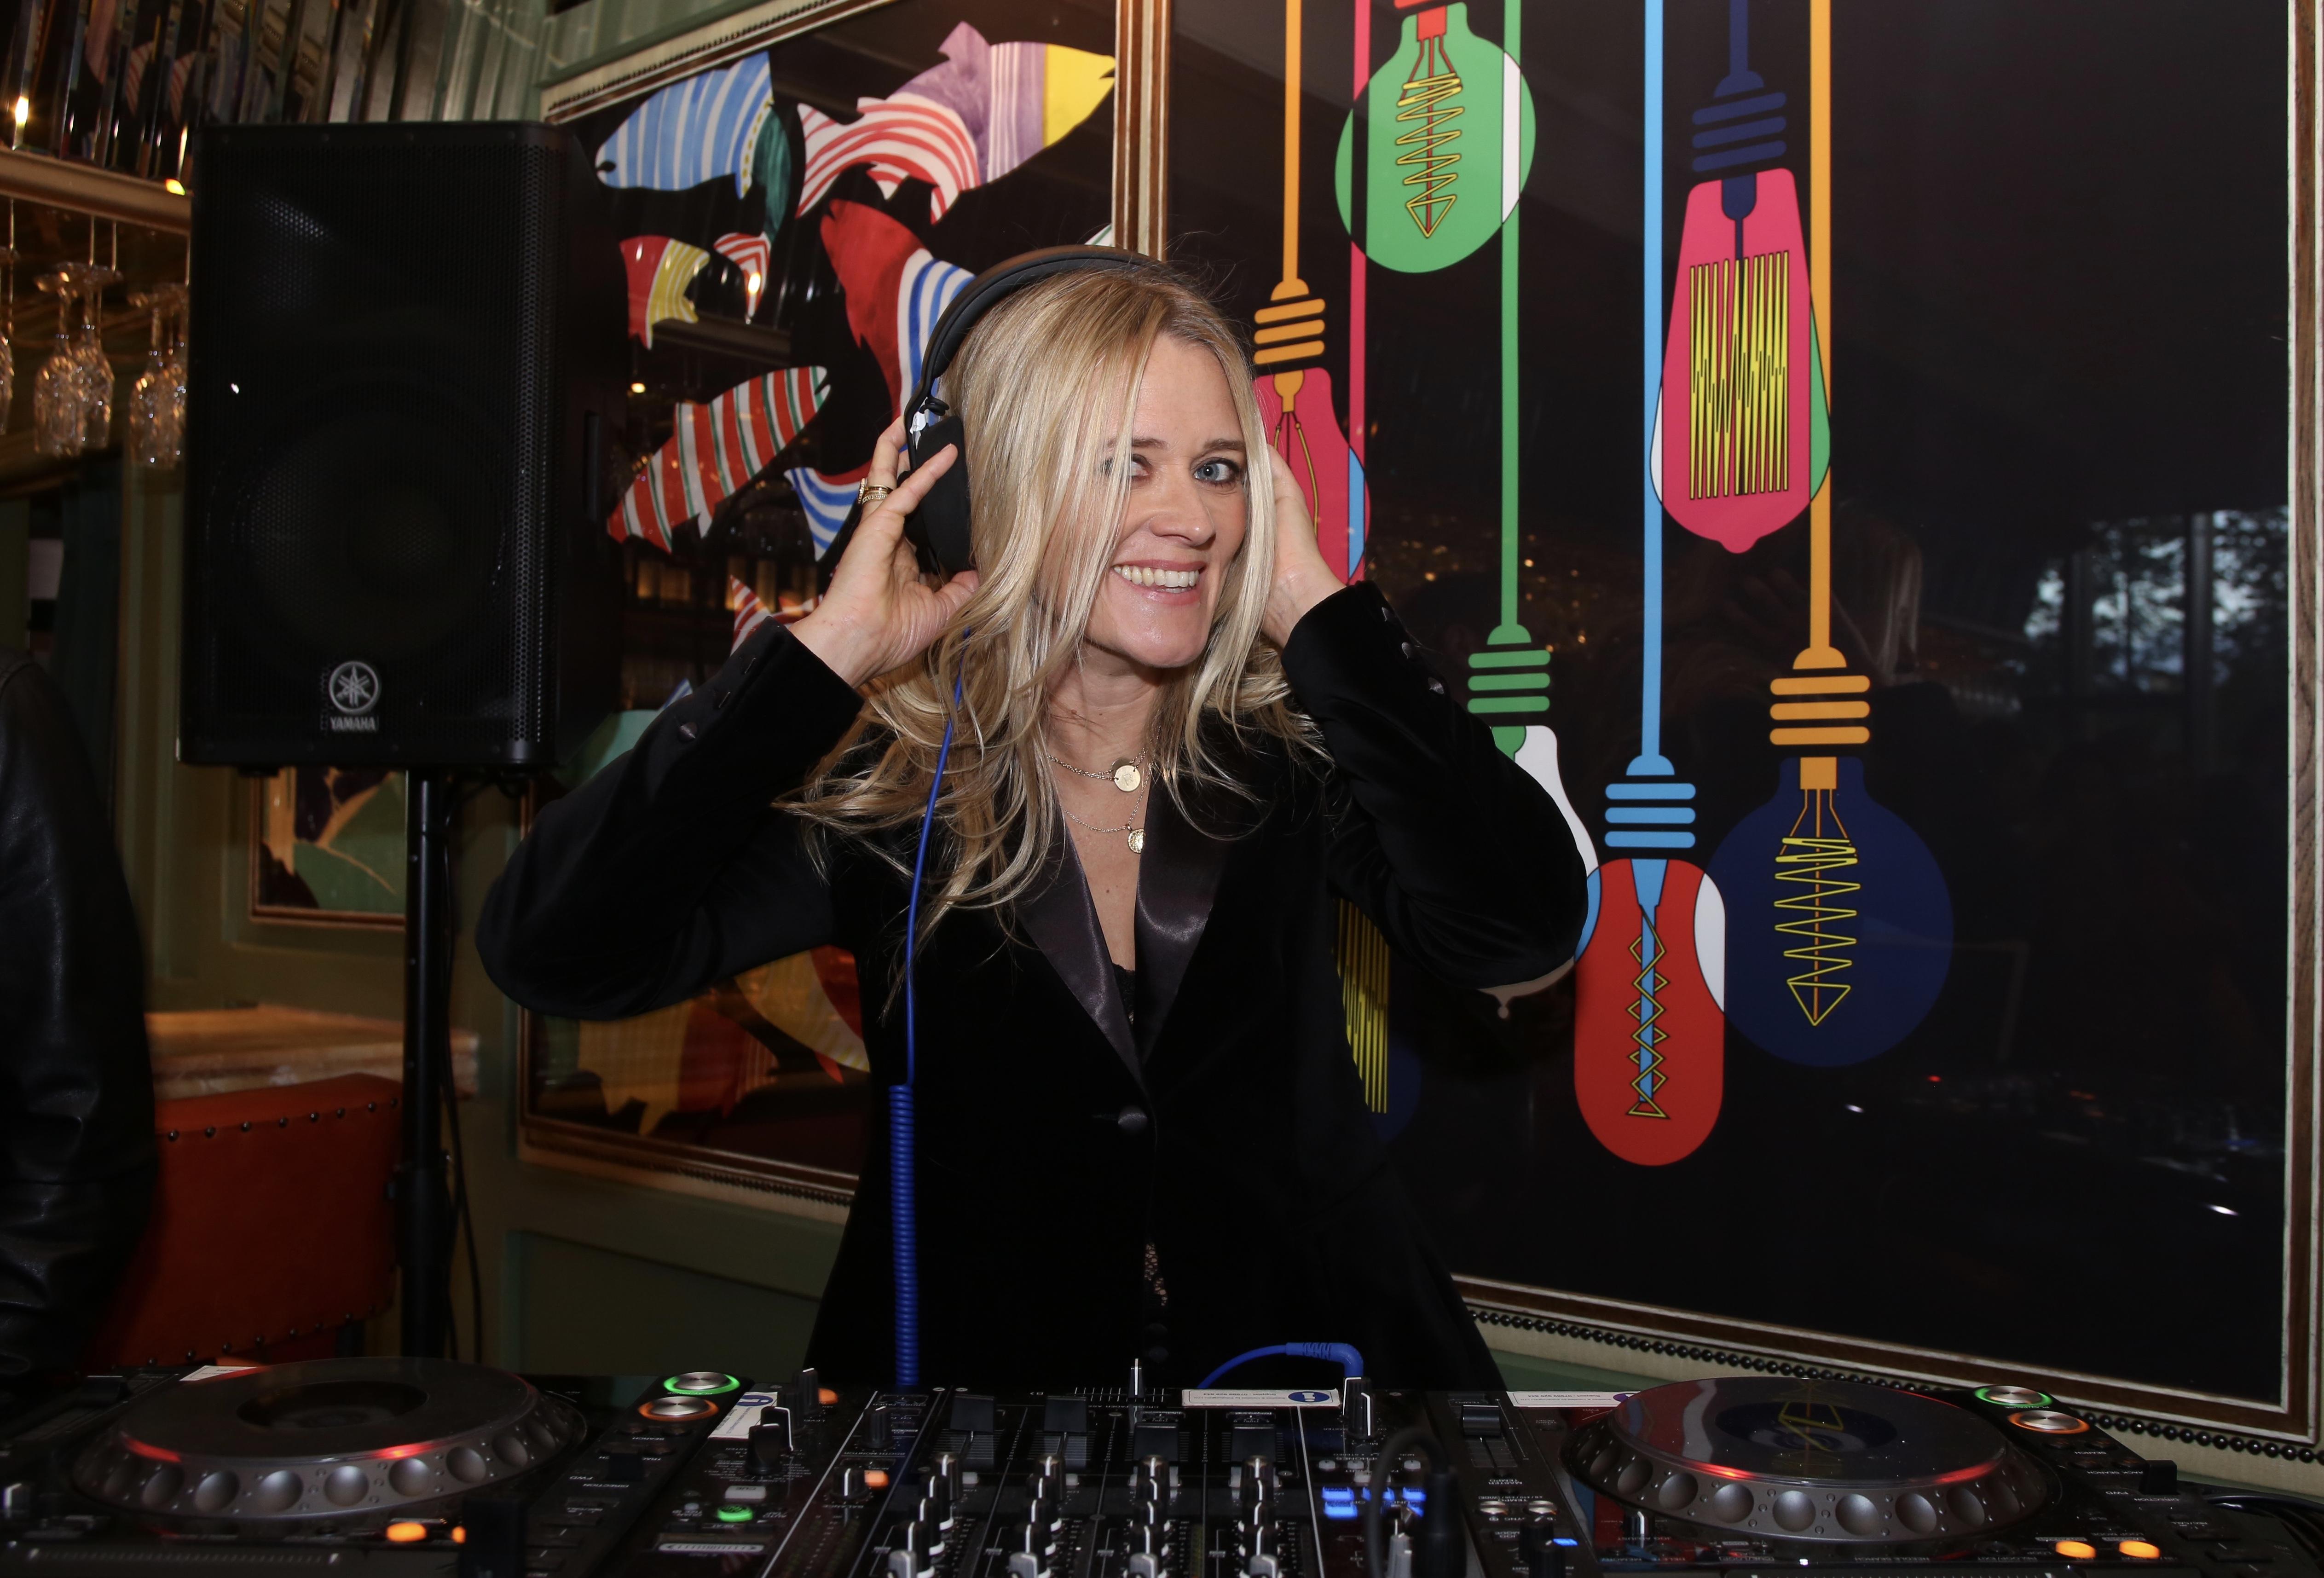 DJ Edith Bowman